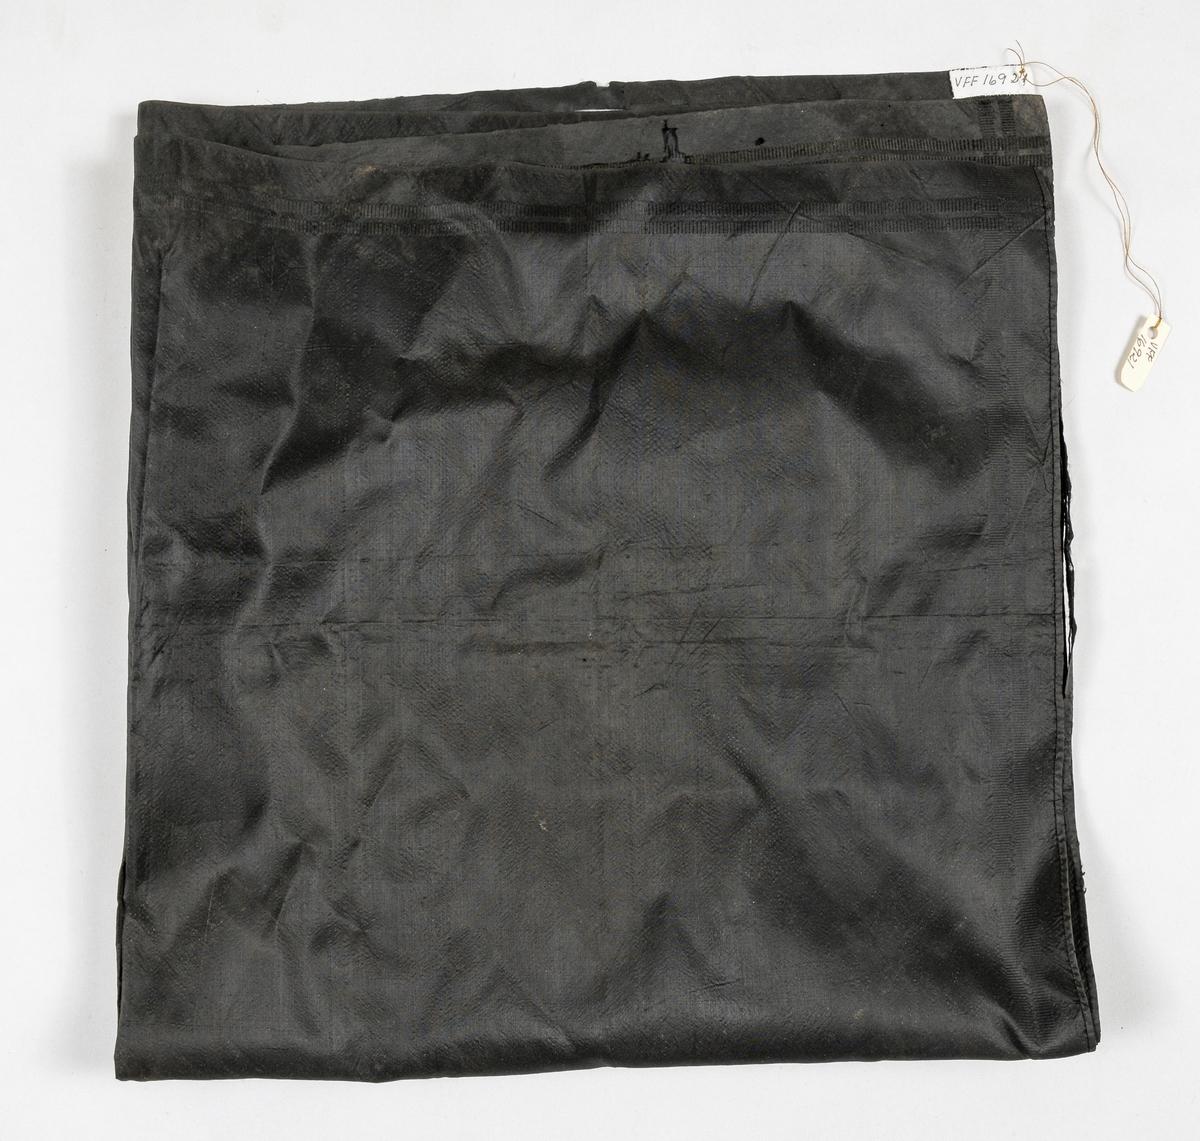 Tørkle i svart silketaft. Falda for hand i to sider, jarekant i dei to andre.